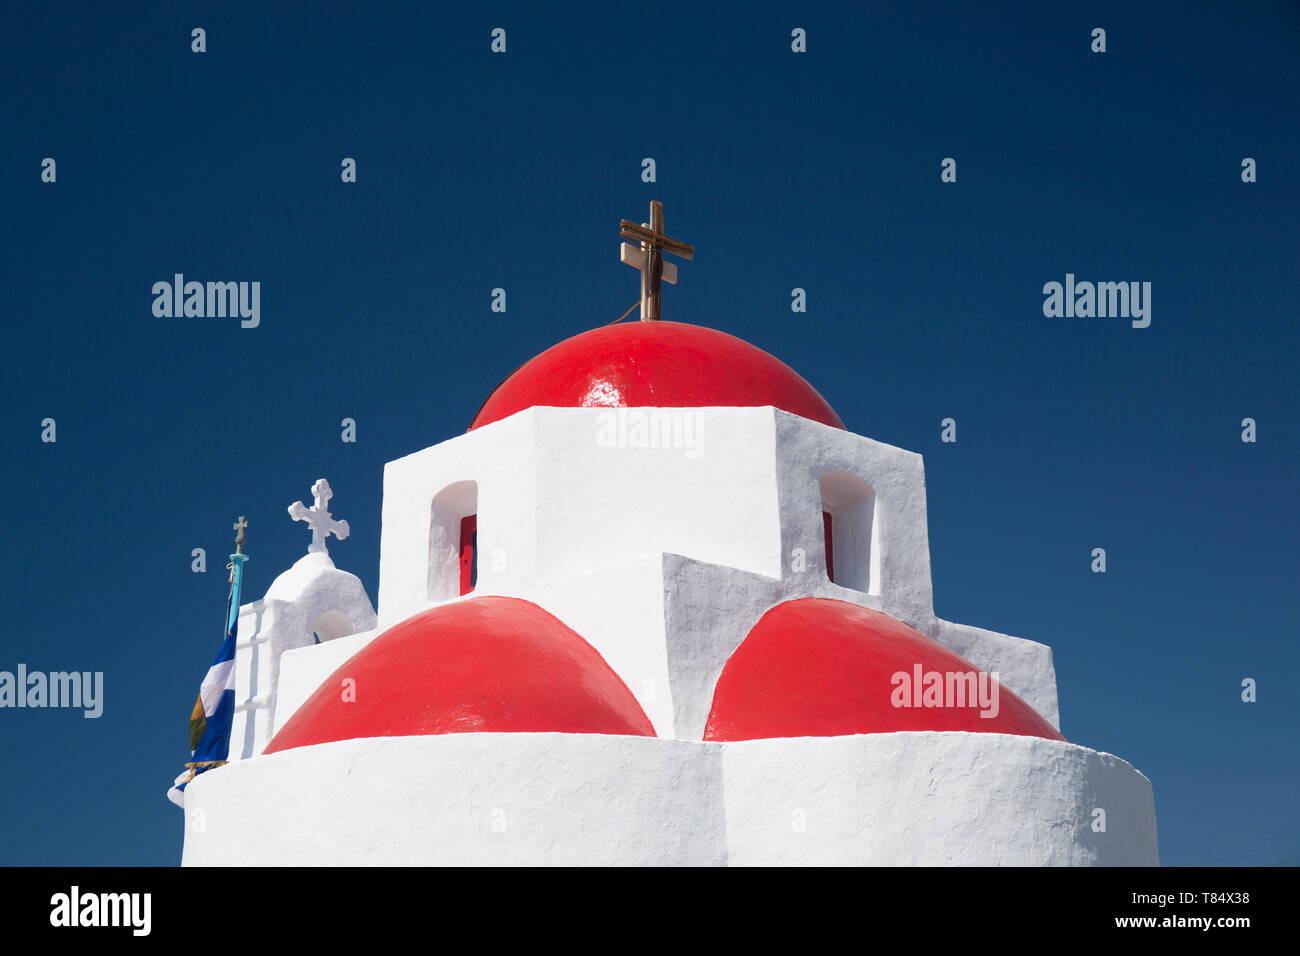 Tourlos, Mykonos, South Aegean, Greece. The red-domed Church of Agia Sofia beneath a deep blue sky. Stock Photo